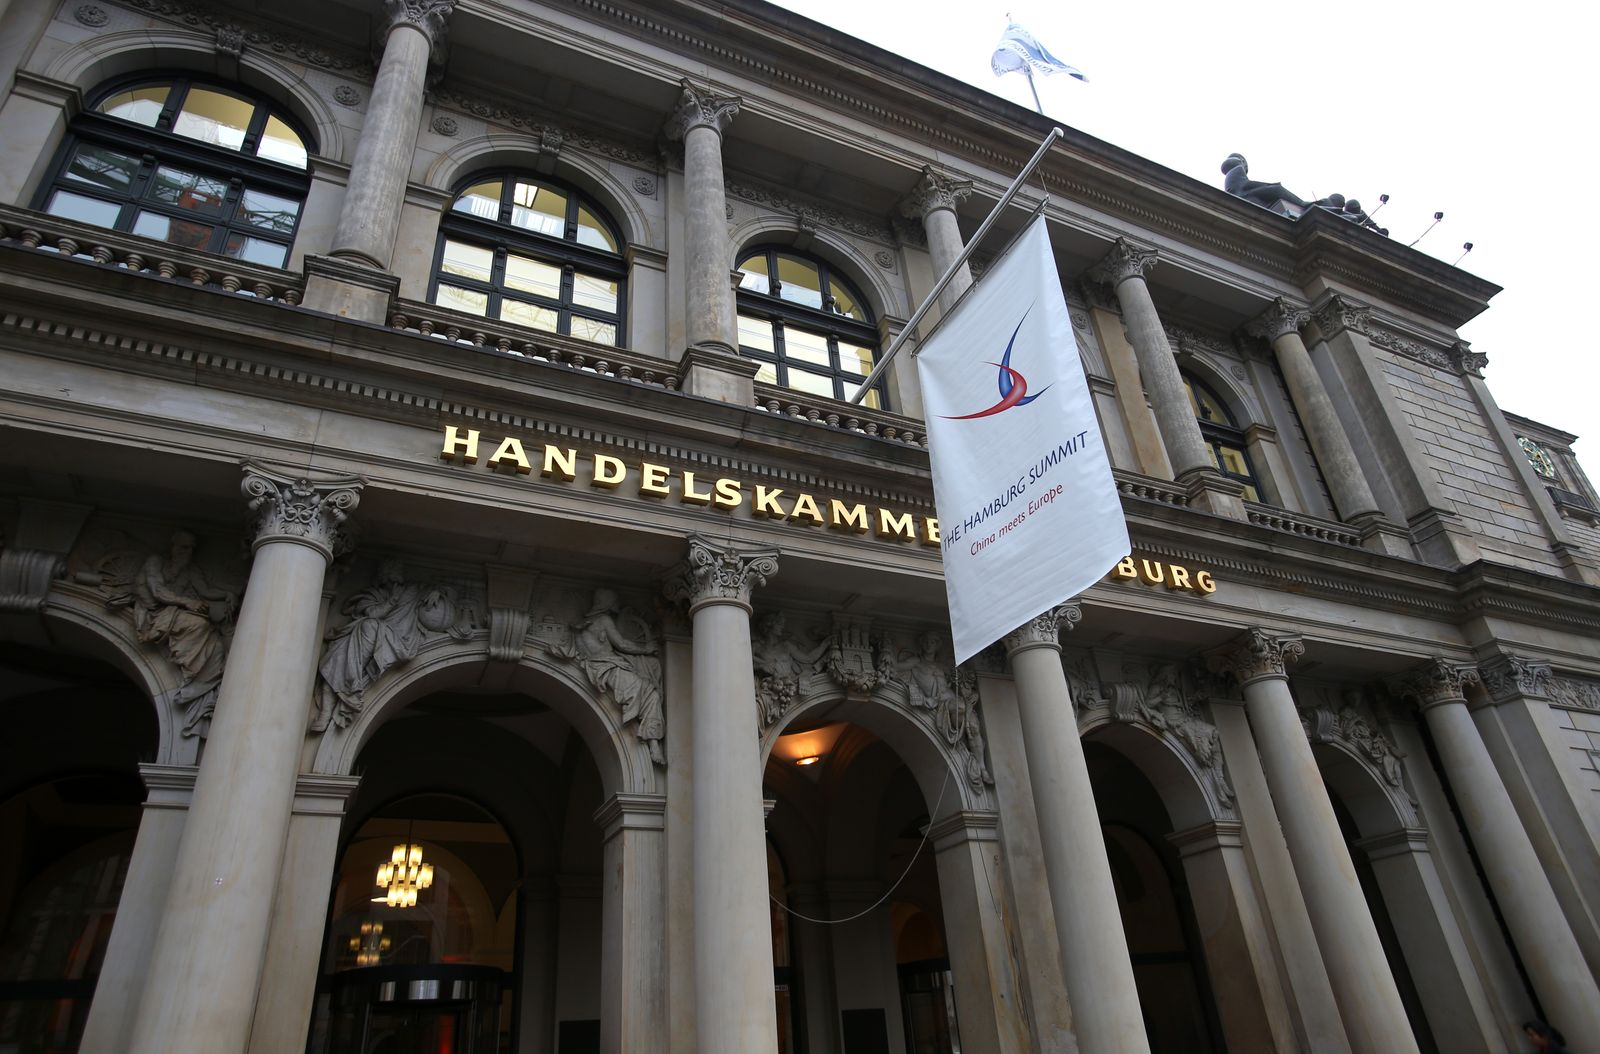 Handelskammer / IHK Hamburg